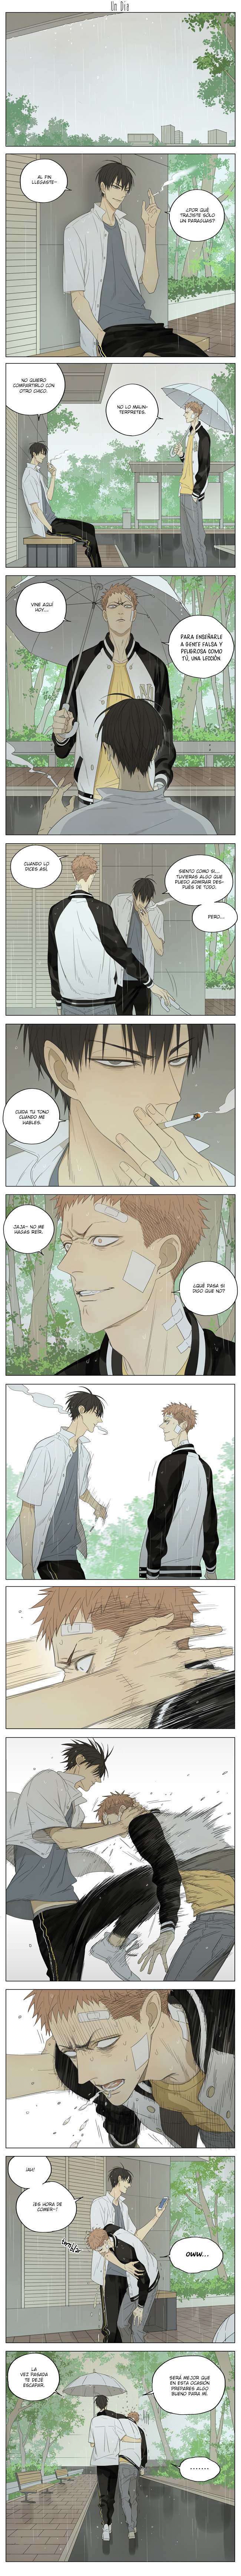 http://c5.ninemanga.com/es_manga/7/15943/435308/2d36217f985d0e382e2513ae9eb67e4c.jpg Page 10